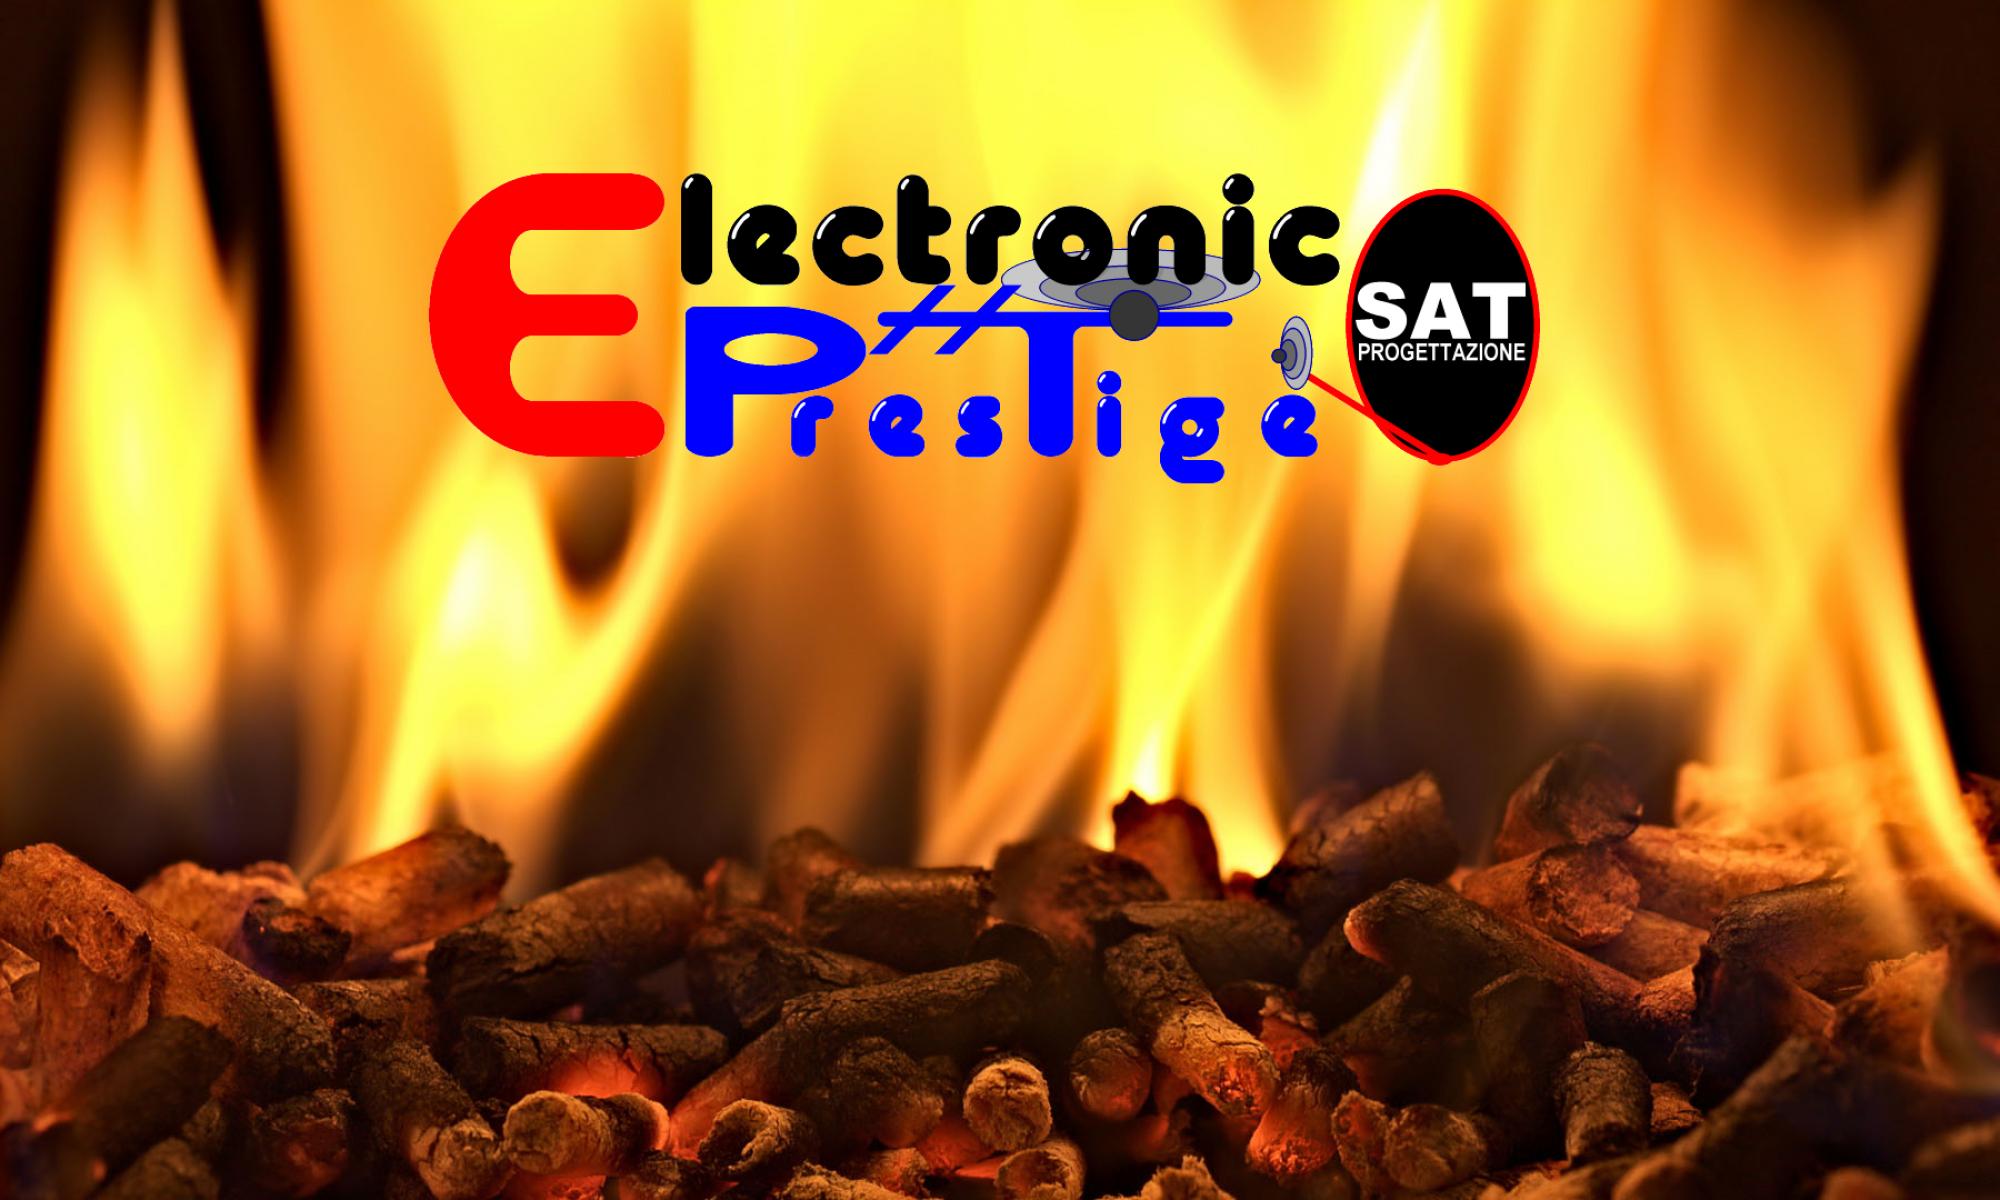 Electronic Prestige